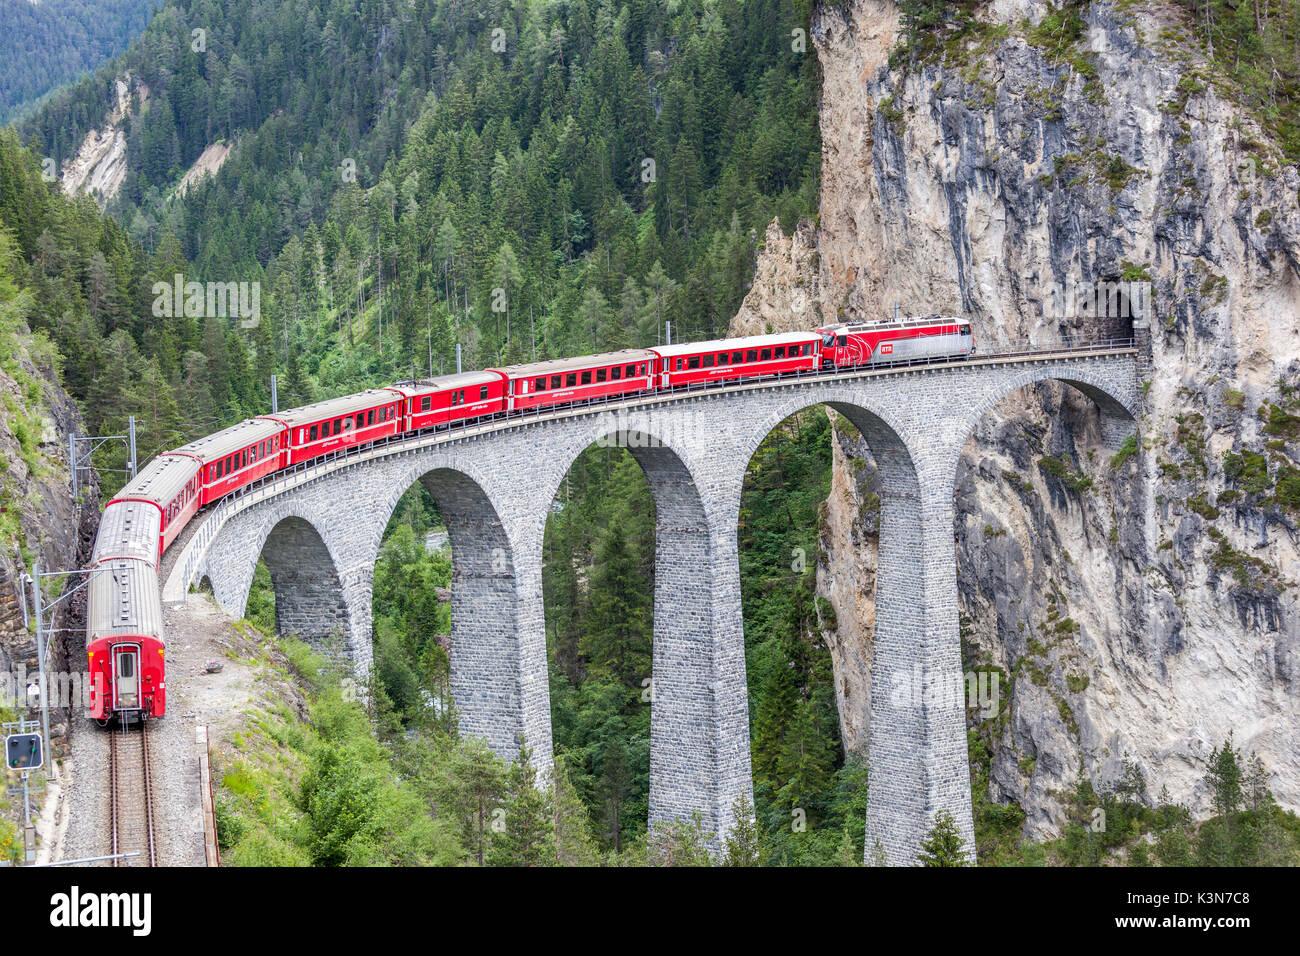 https://c8.alamy.com/comp/K3N7C8/glacier-express-landwasser-viaduct-filisur-graubunden-switzerland-K3N7C8.jpg